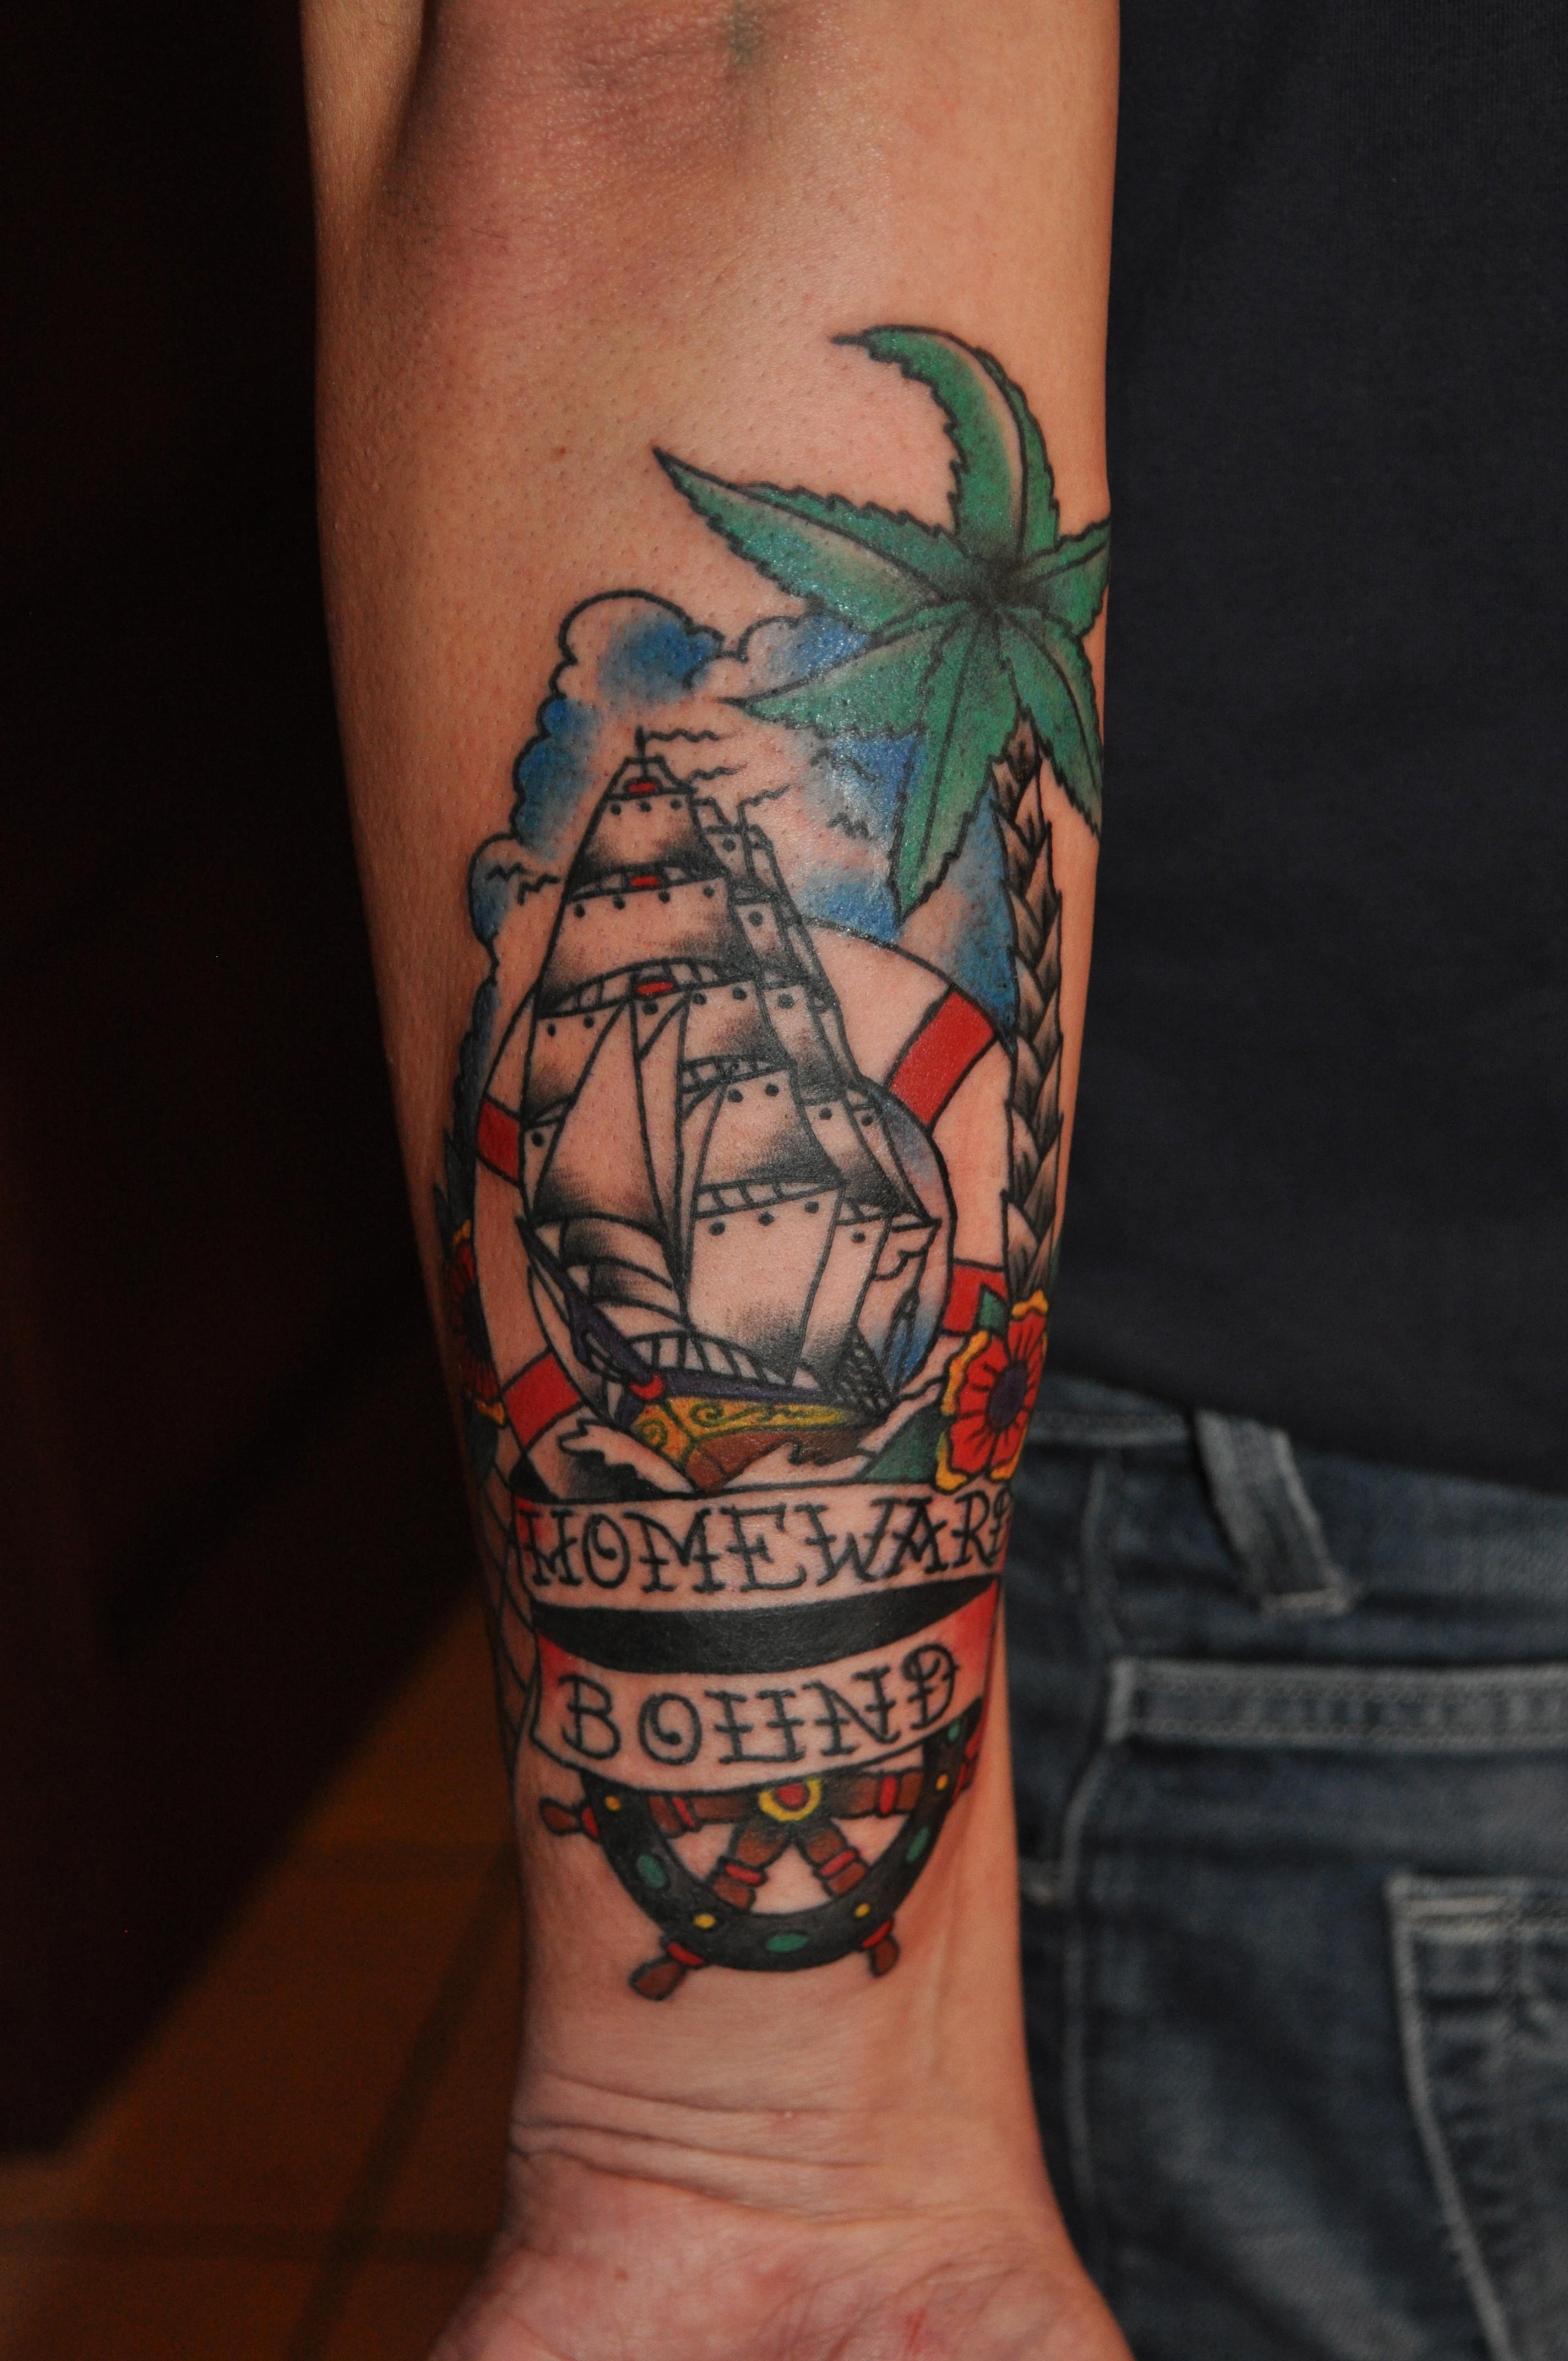 Rose Tattoo Amsterdam, Bill Loika, Traditional American, Americana, Old school tattoos, Color tattoos, Traditional Western, Quality tattoos, Amsterdam tattoo shop